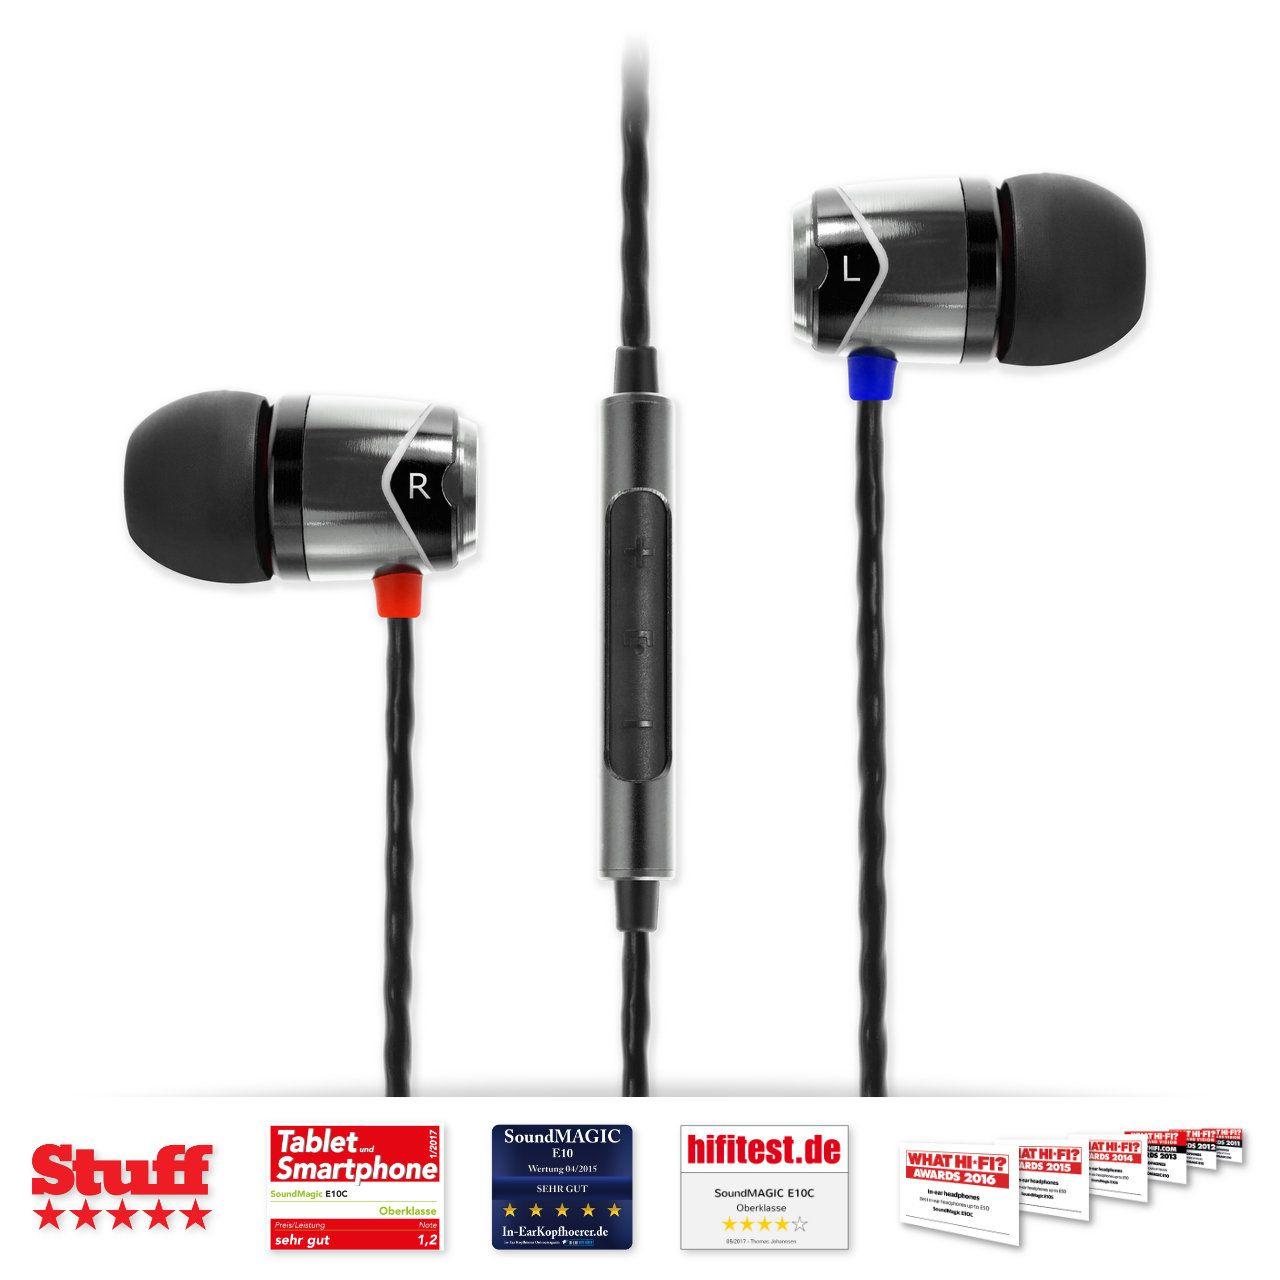 SoundMAGIC E10C - mehrfacher Testsieger zum Tiefstpreis